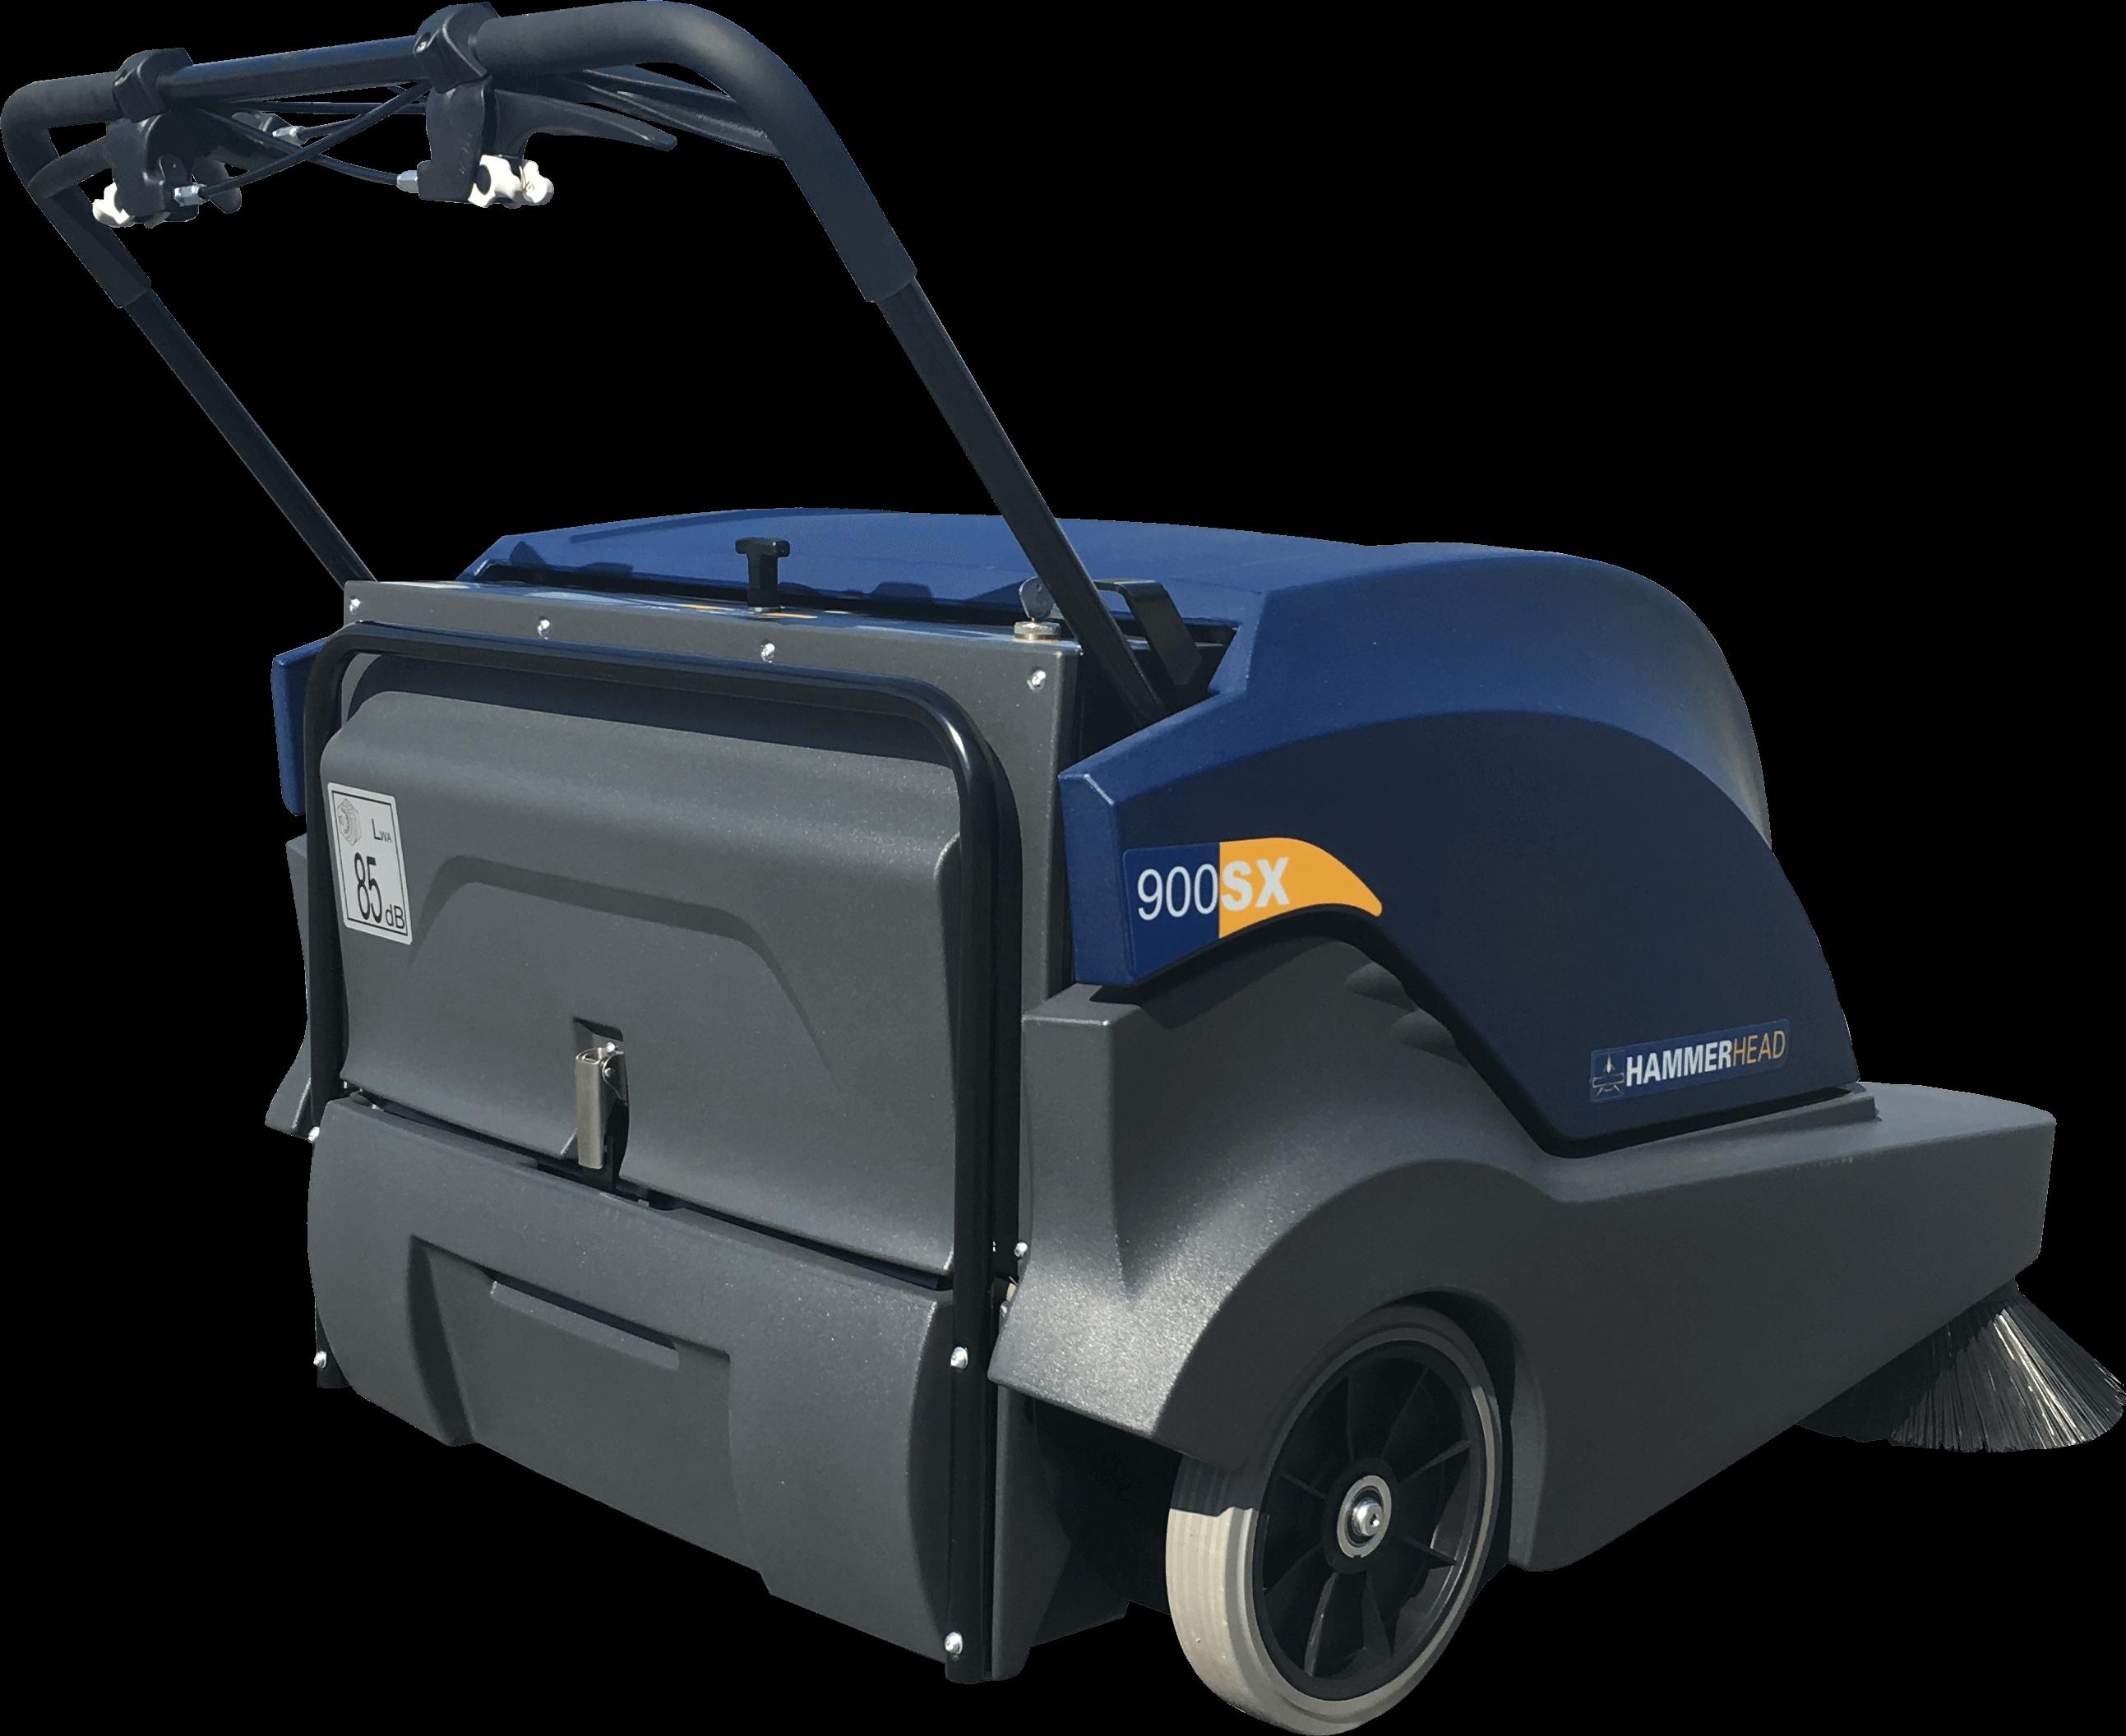 Hammerhead 900sx Sweeper Bortek Industries Inc